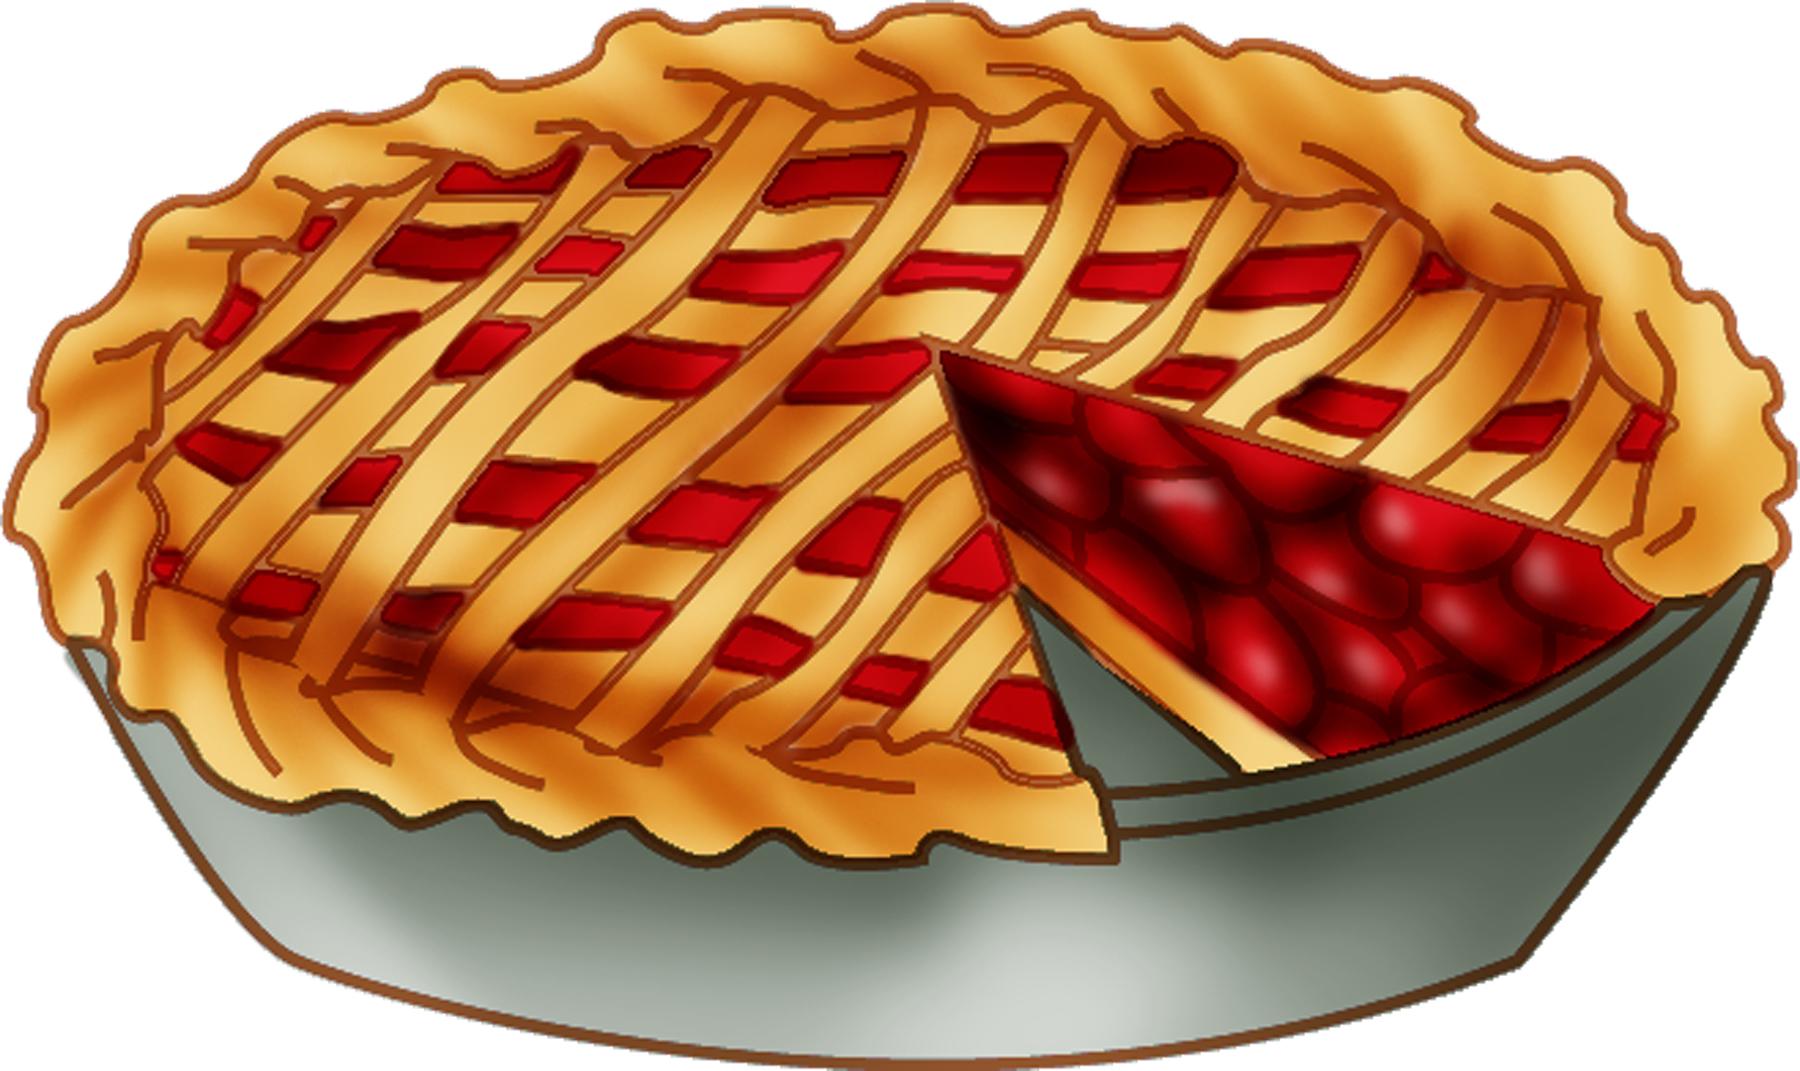 apple pie clip art free - photo #36